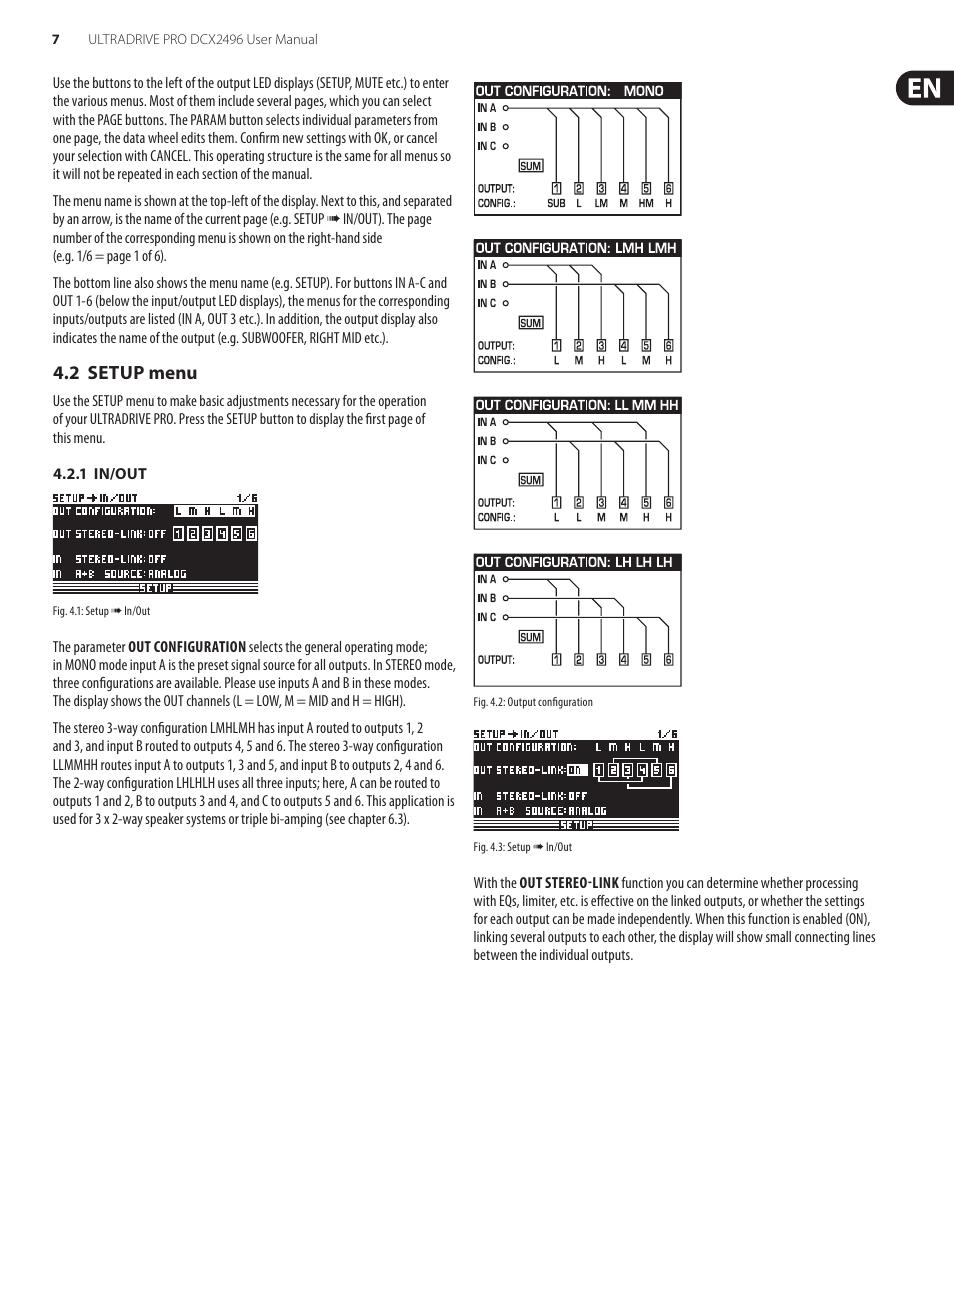 behringer ultradrive pro dcx2496 user manual page 7 35 rh manualsdir com Behringer 2496 Mods Behringer Ultradrive Pro DCX2496 Manual